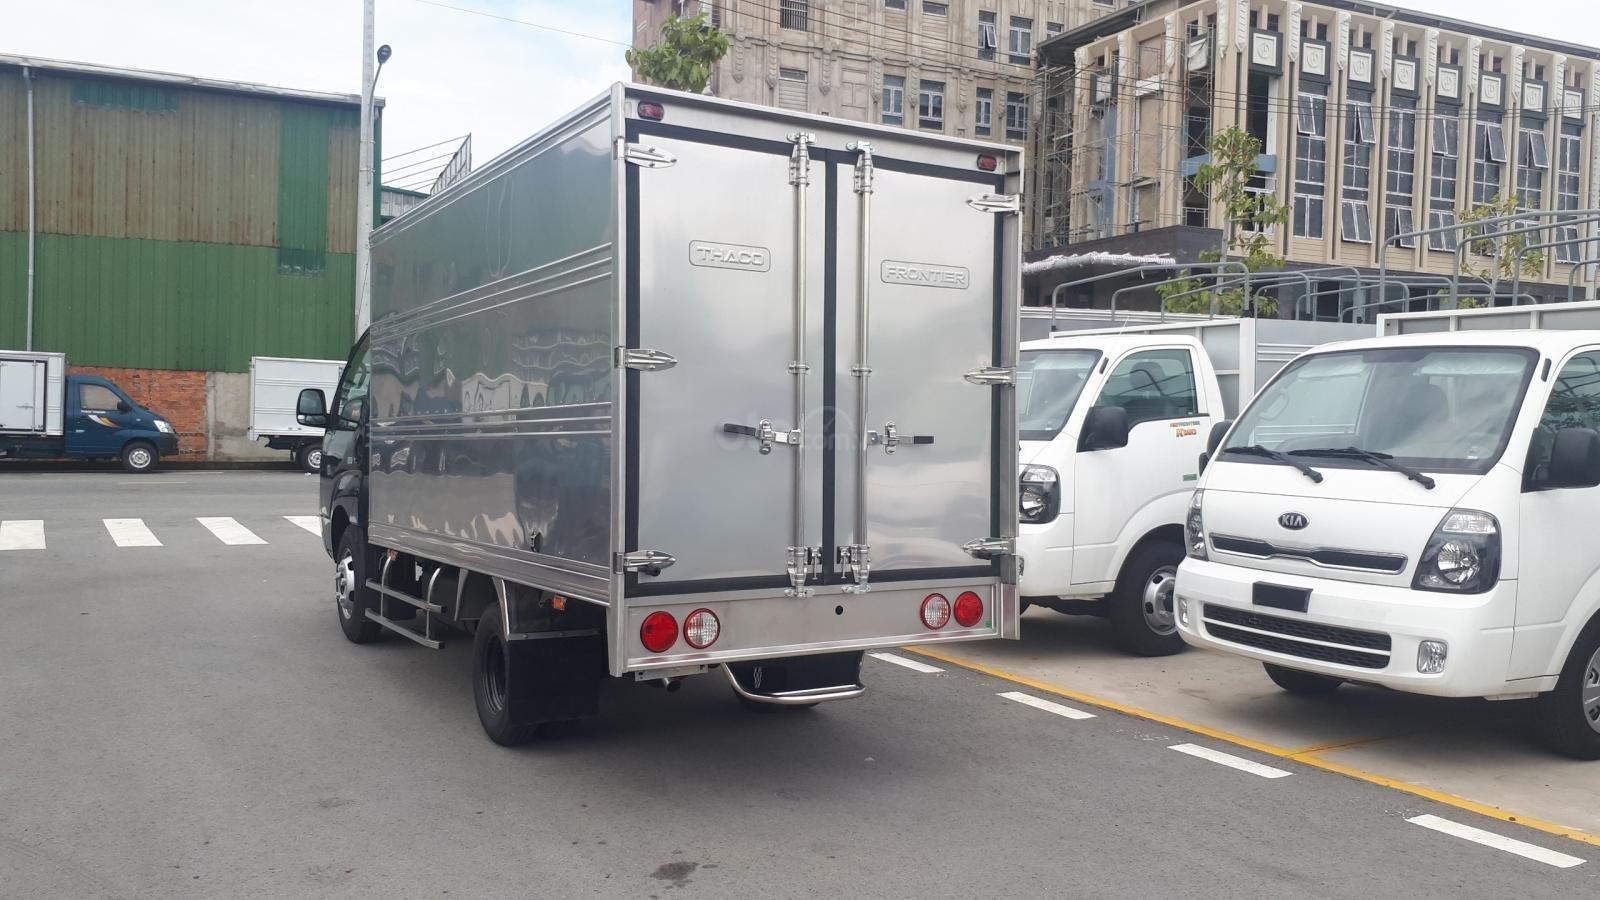 Xe tải Kia 990kg - 1.4 tấn - 1.9 tấn - trả góp - LH em 0938380032 (2)